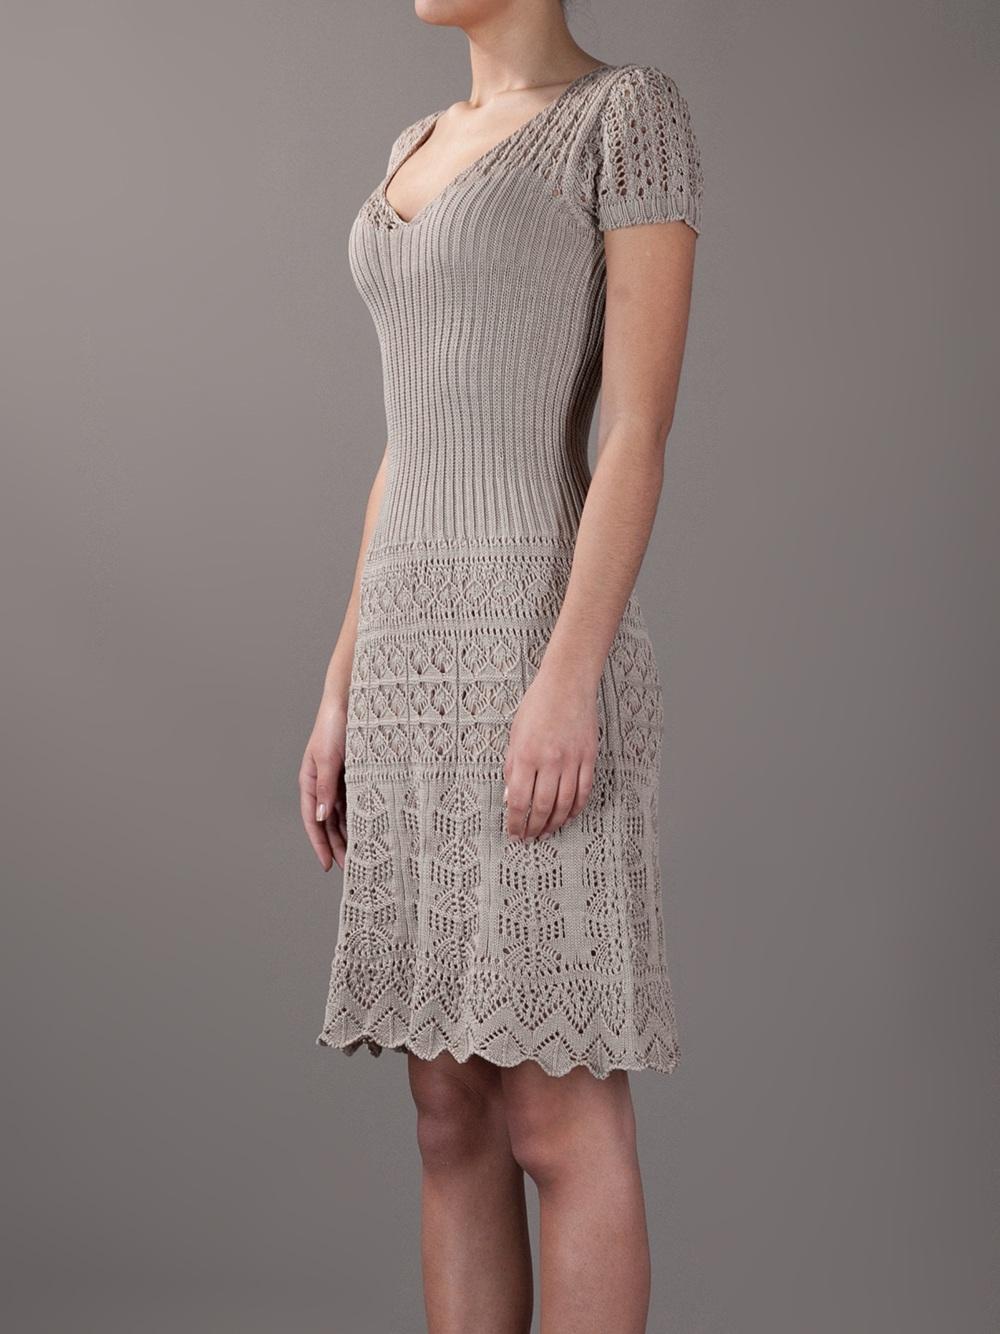 Lavish Women S Clothing